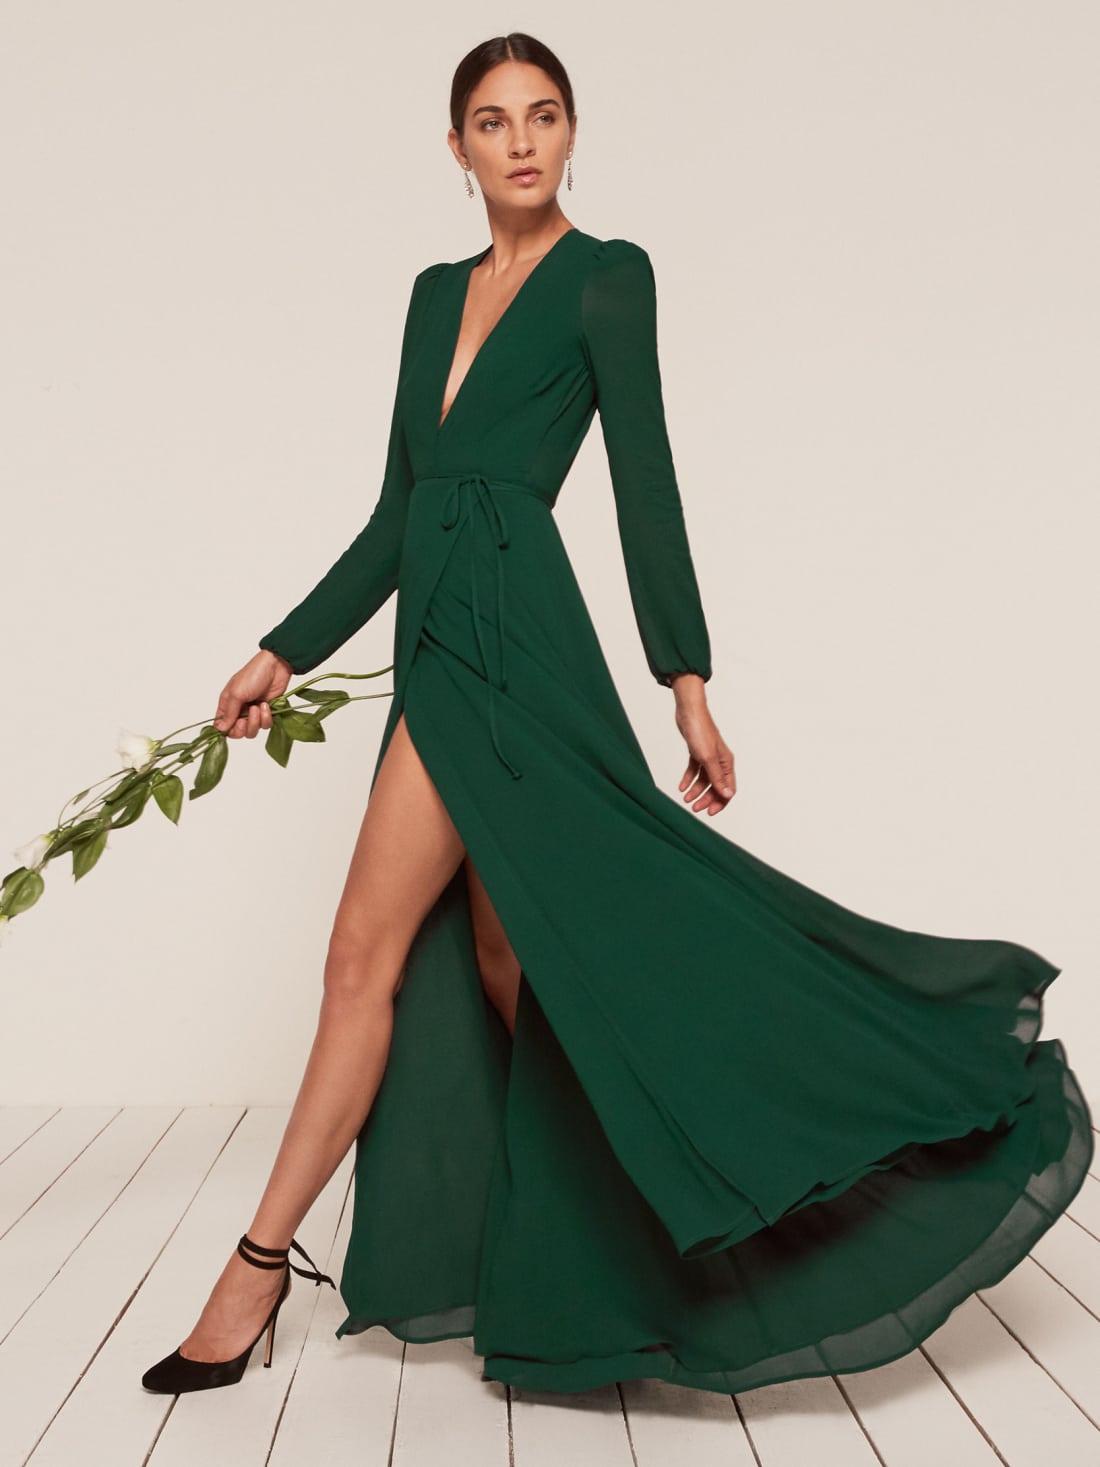 Pin On Dresses [ 1467 x 1100 Pixel ]